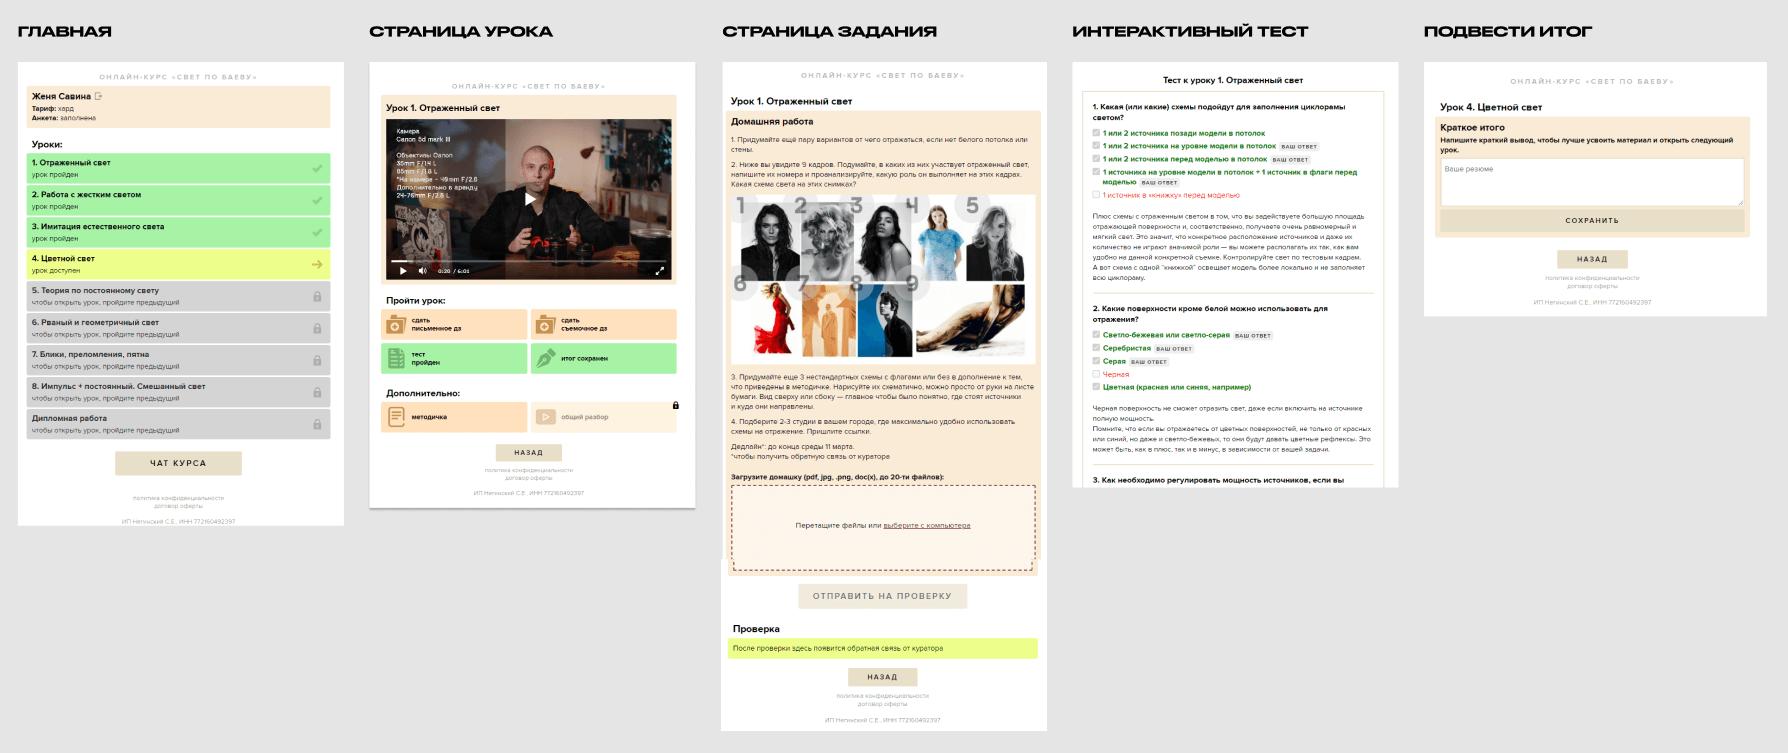 Разработал дизайн личного кабинета онлайн-курса Максима Баева 1